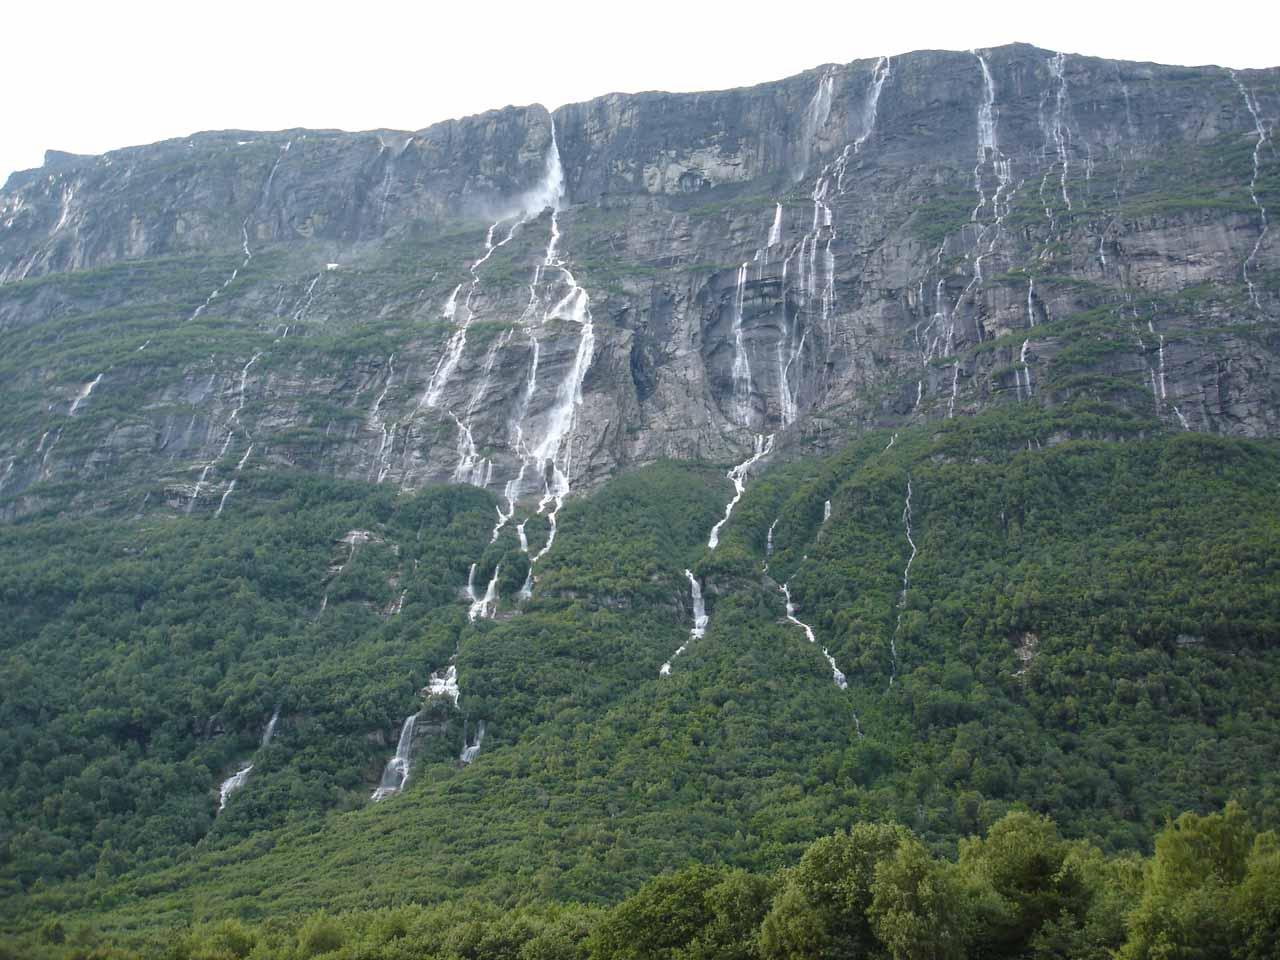 Vinnufossen along with other waterfalls tumbling alongside it